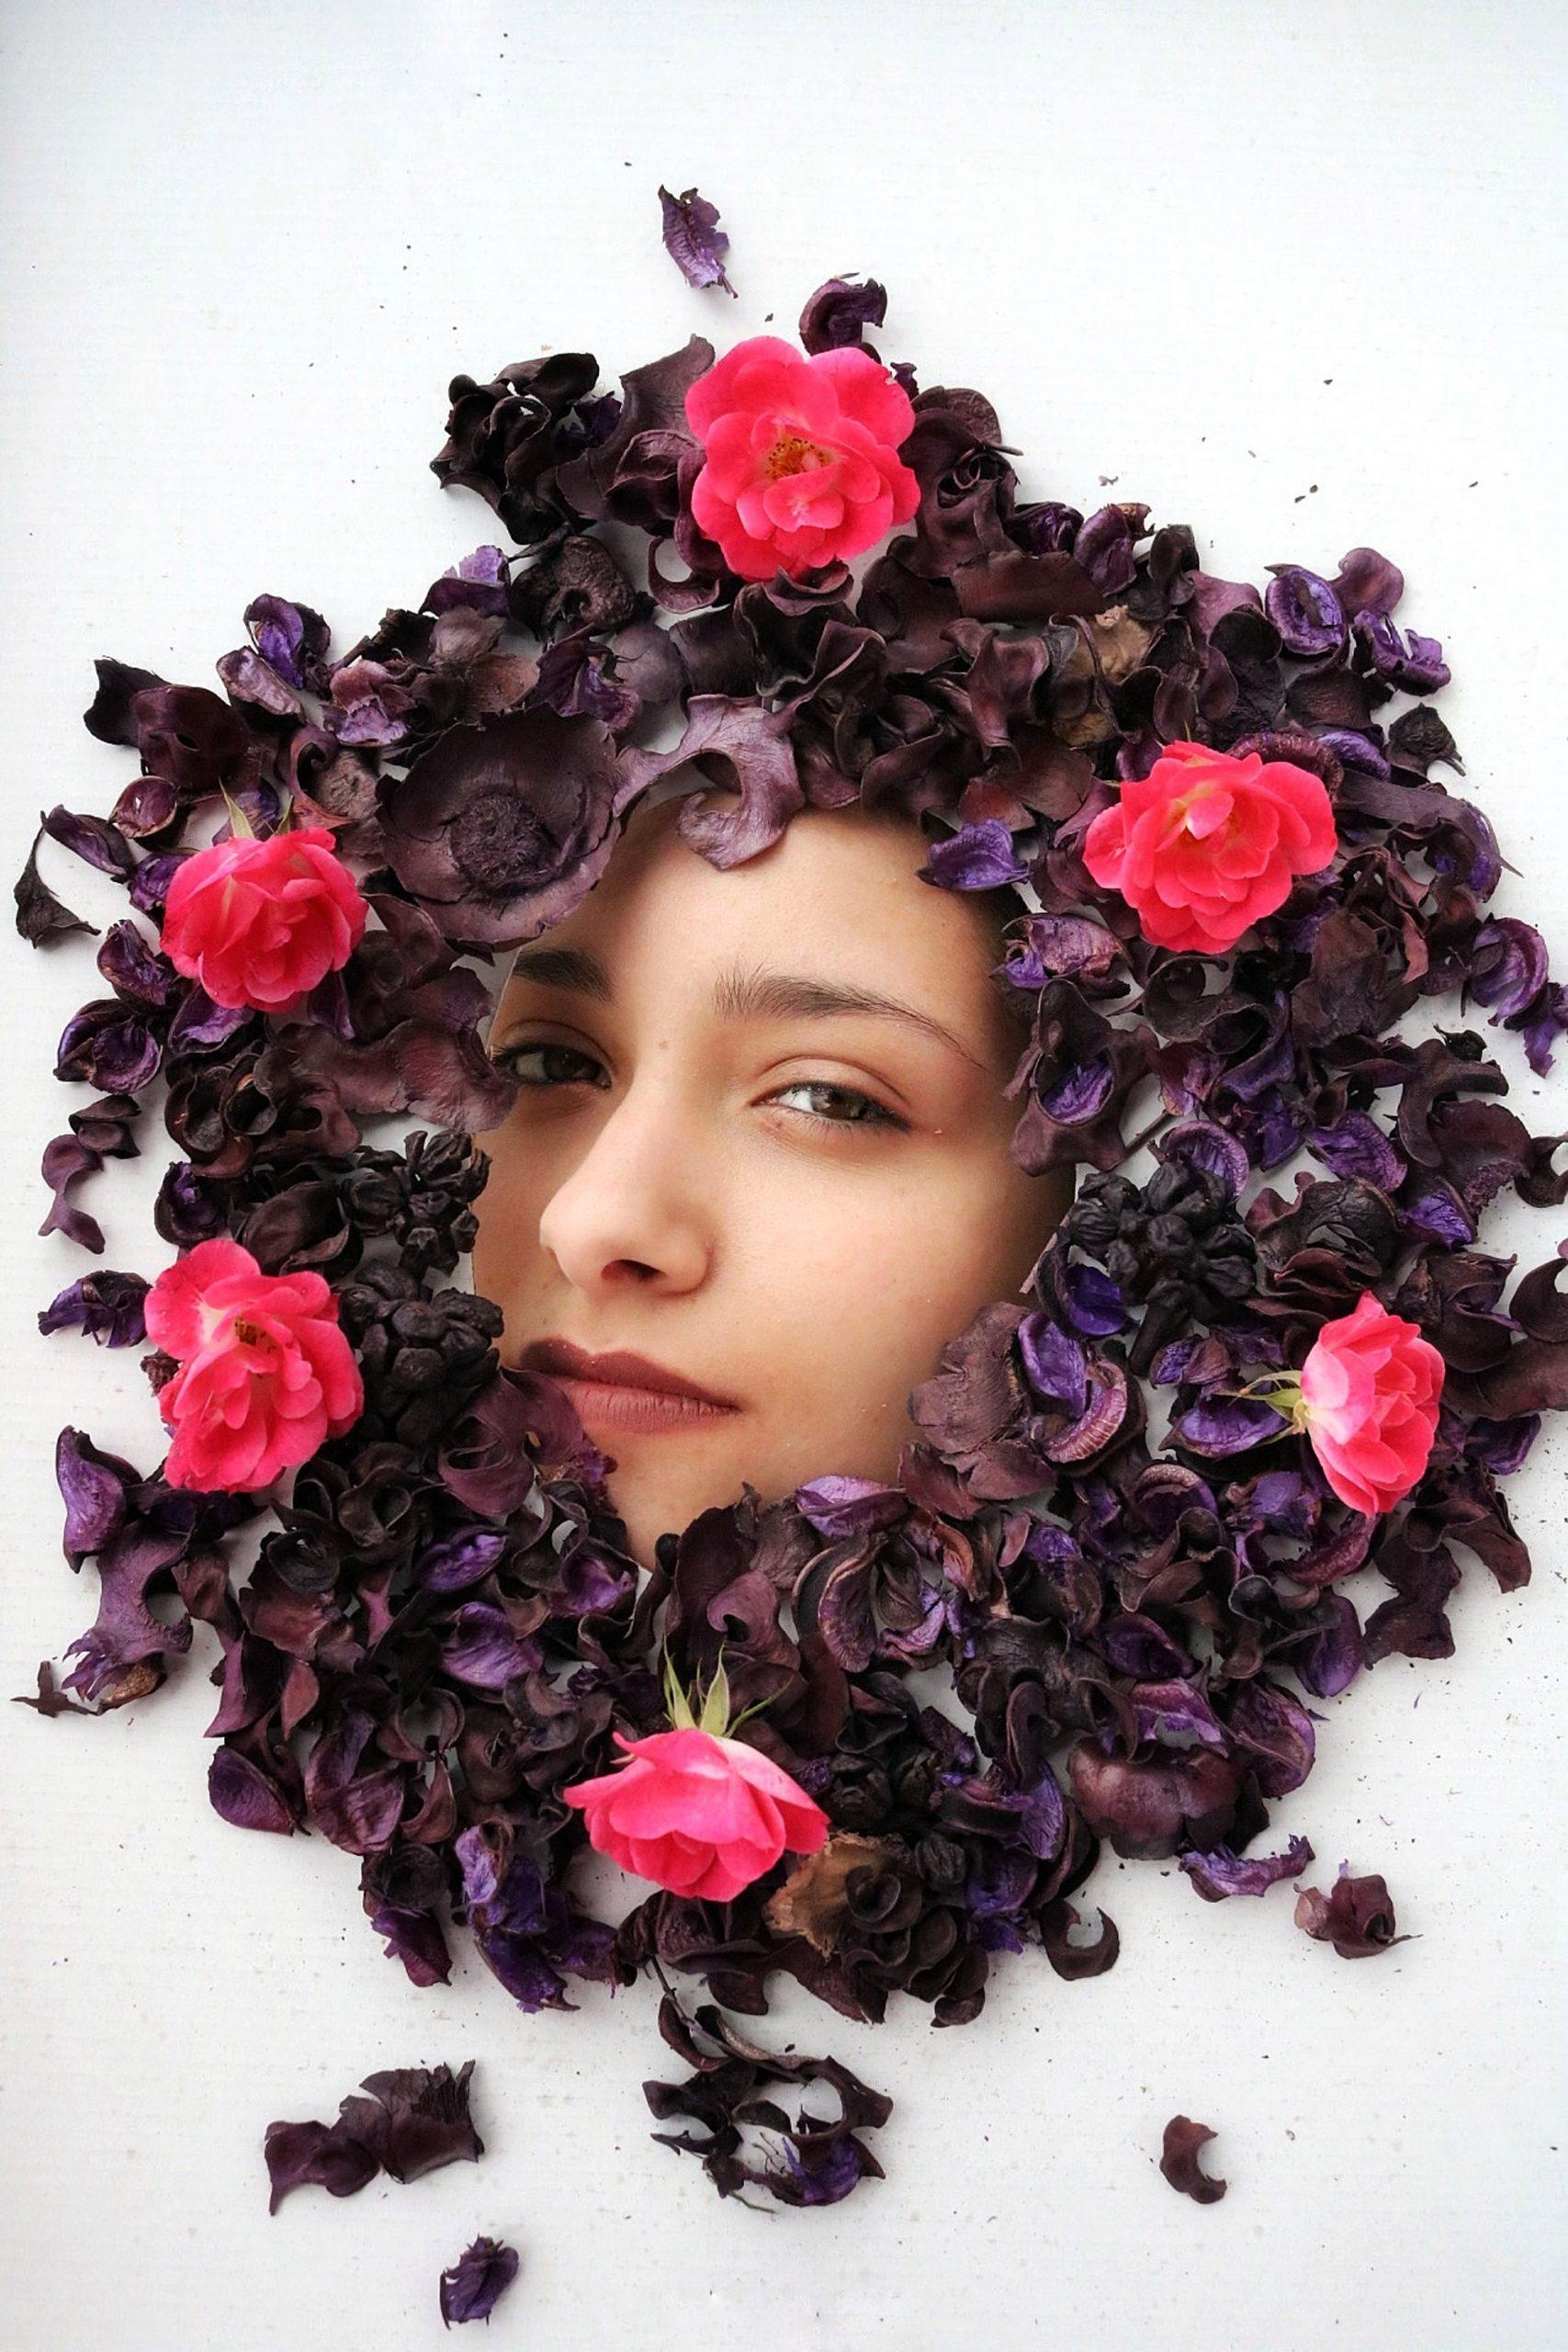 Categoria: Portrait; Photographer: PATRIZIA DELFINO; Model: ANDRY TARANTO; Location: Cuneo, CN, Italia